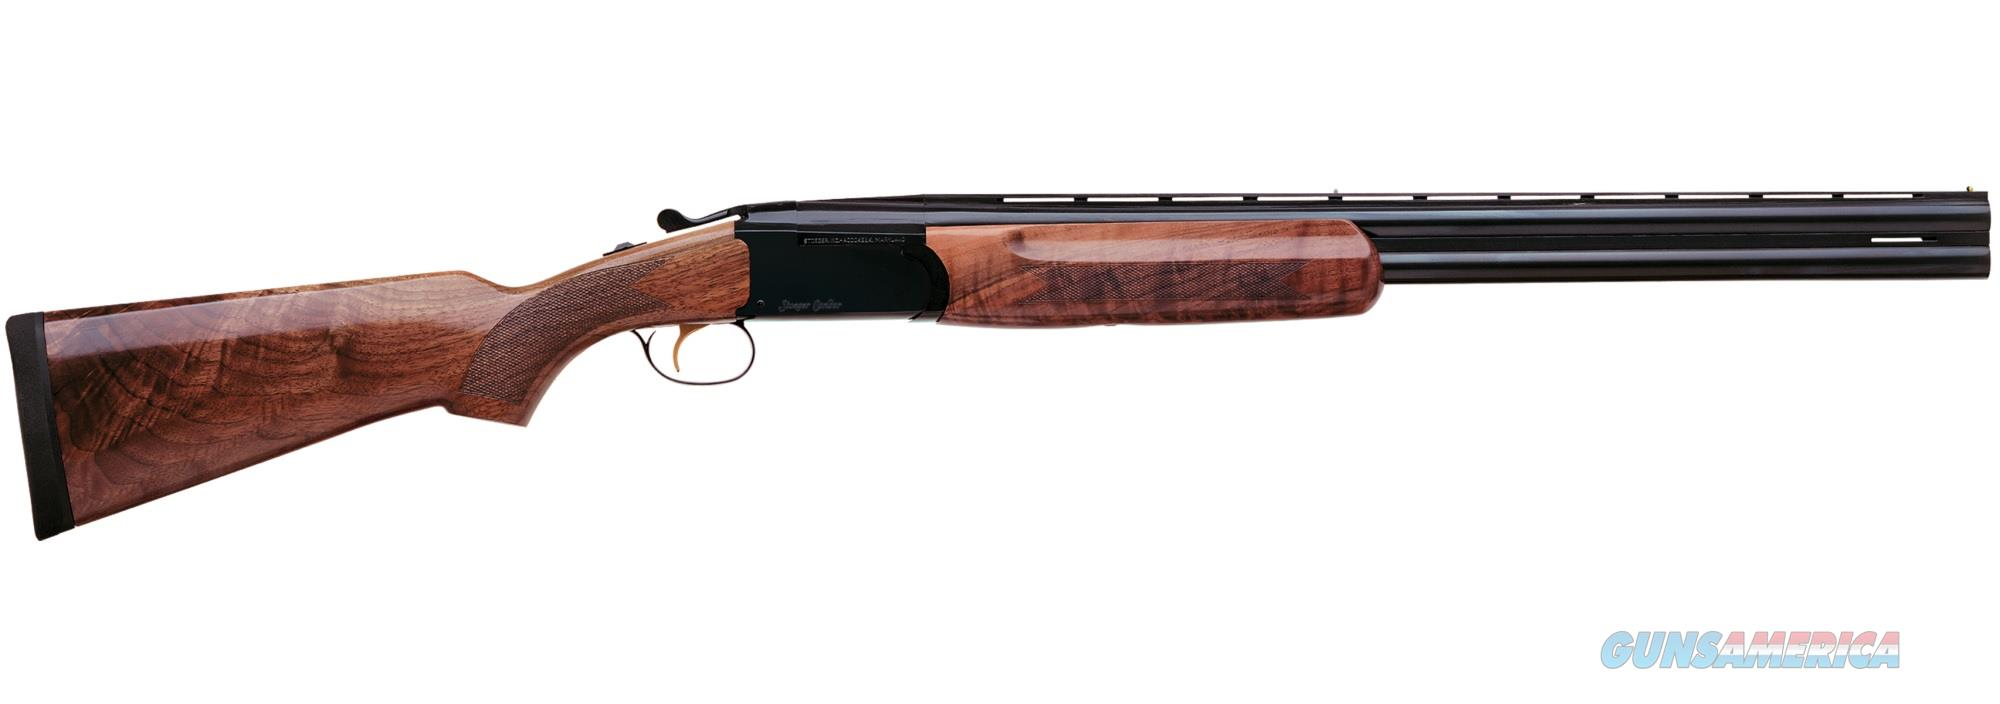 "Stoeger Condor Supreme 20 Gauge O/U Walnut 26"" 31015   Guns > Shotguns > Stoeger Shotguns"